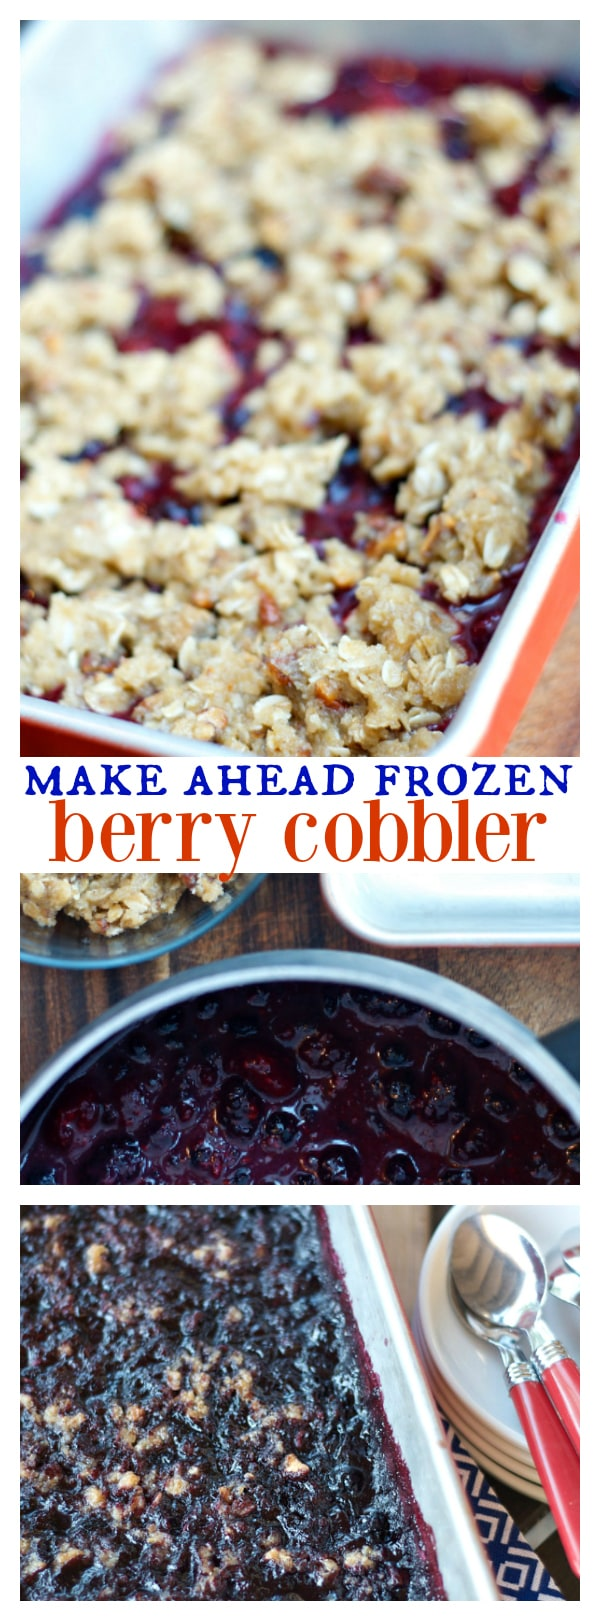 Make-Ahead Frozen Berry Cobbler